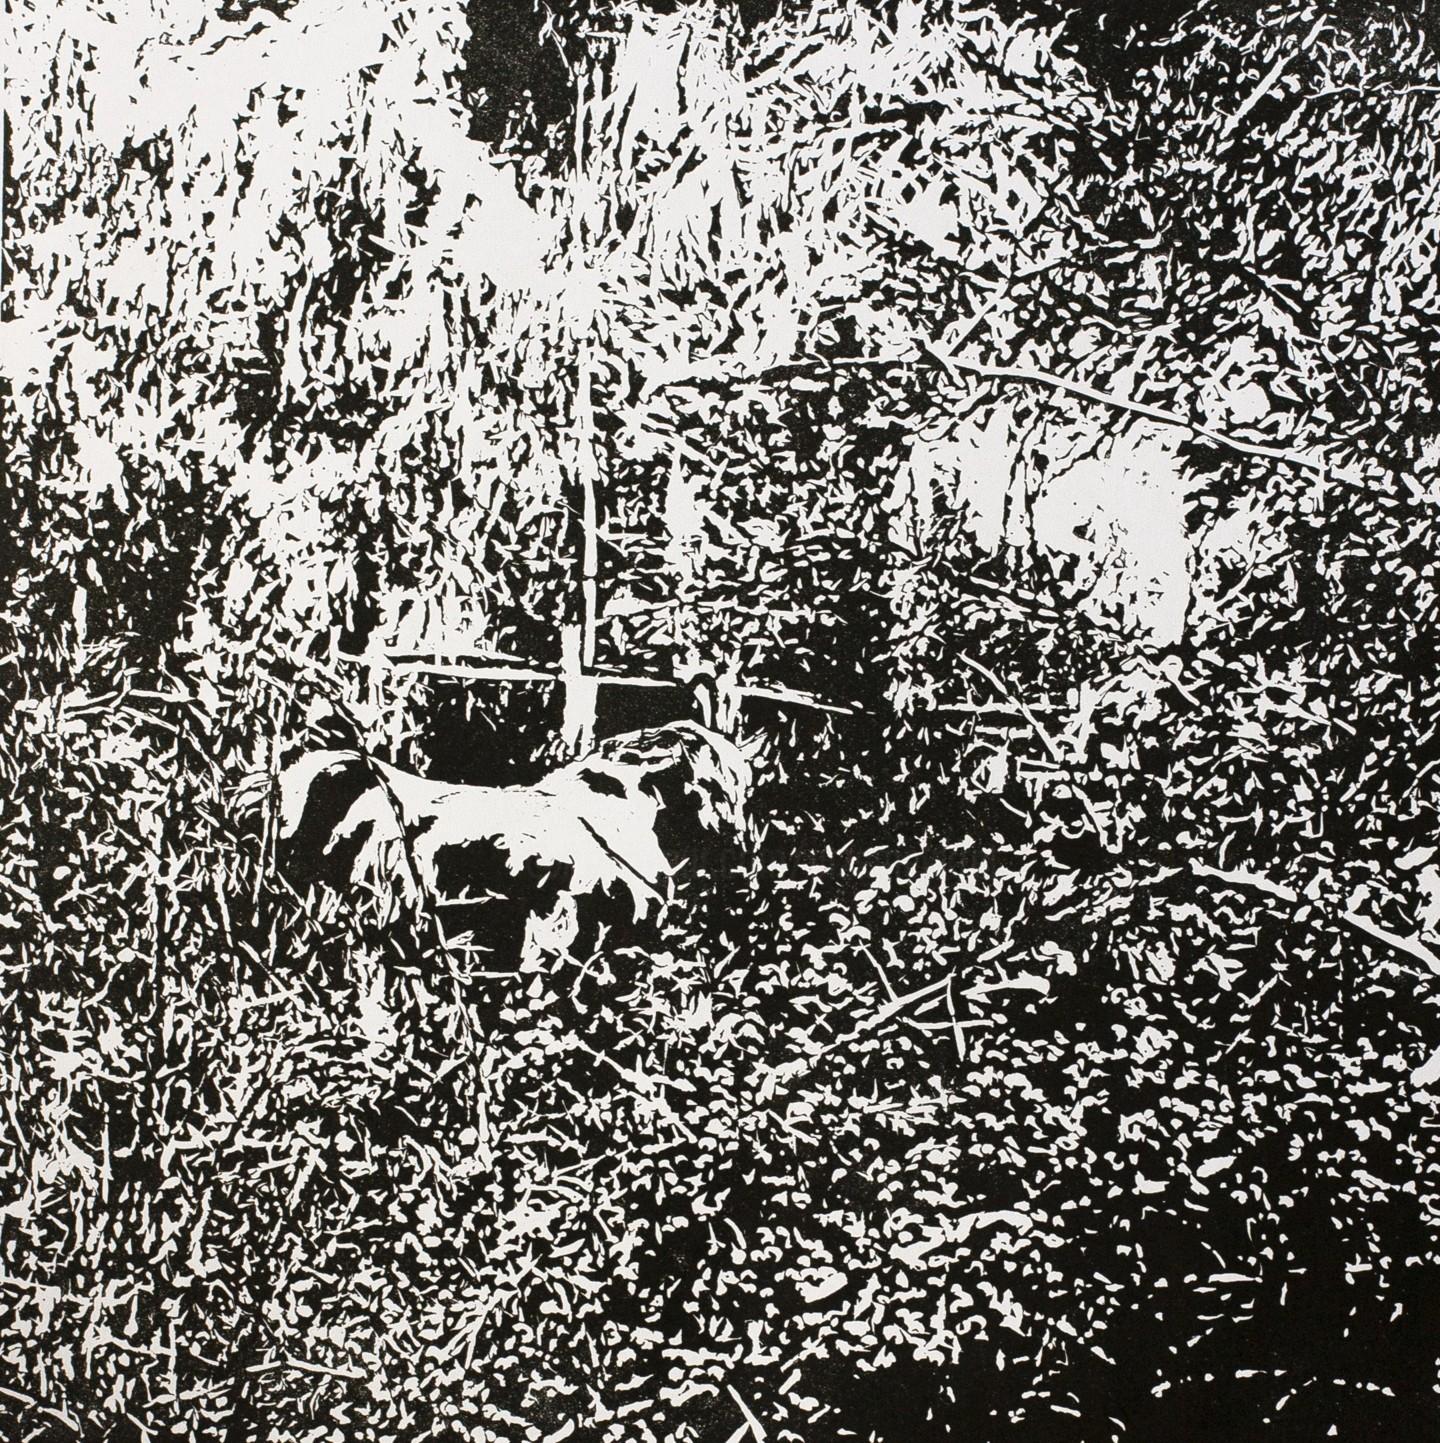 Przemek Kret - Forest Edge